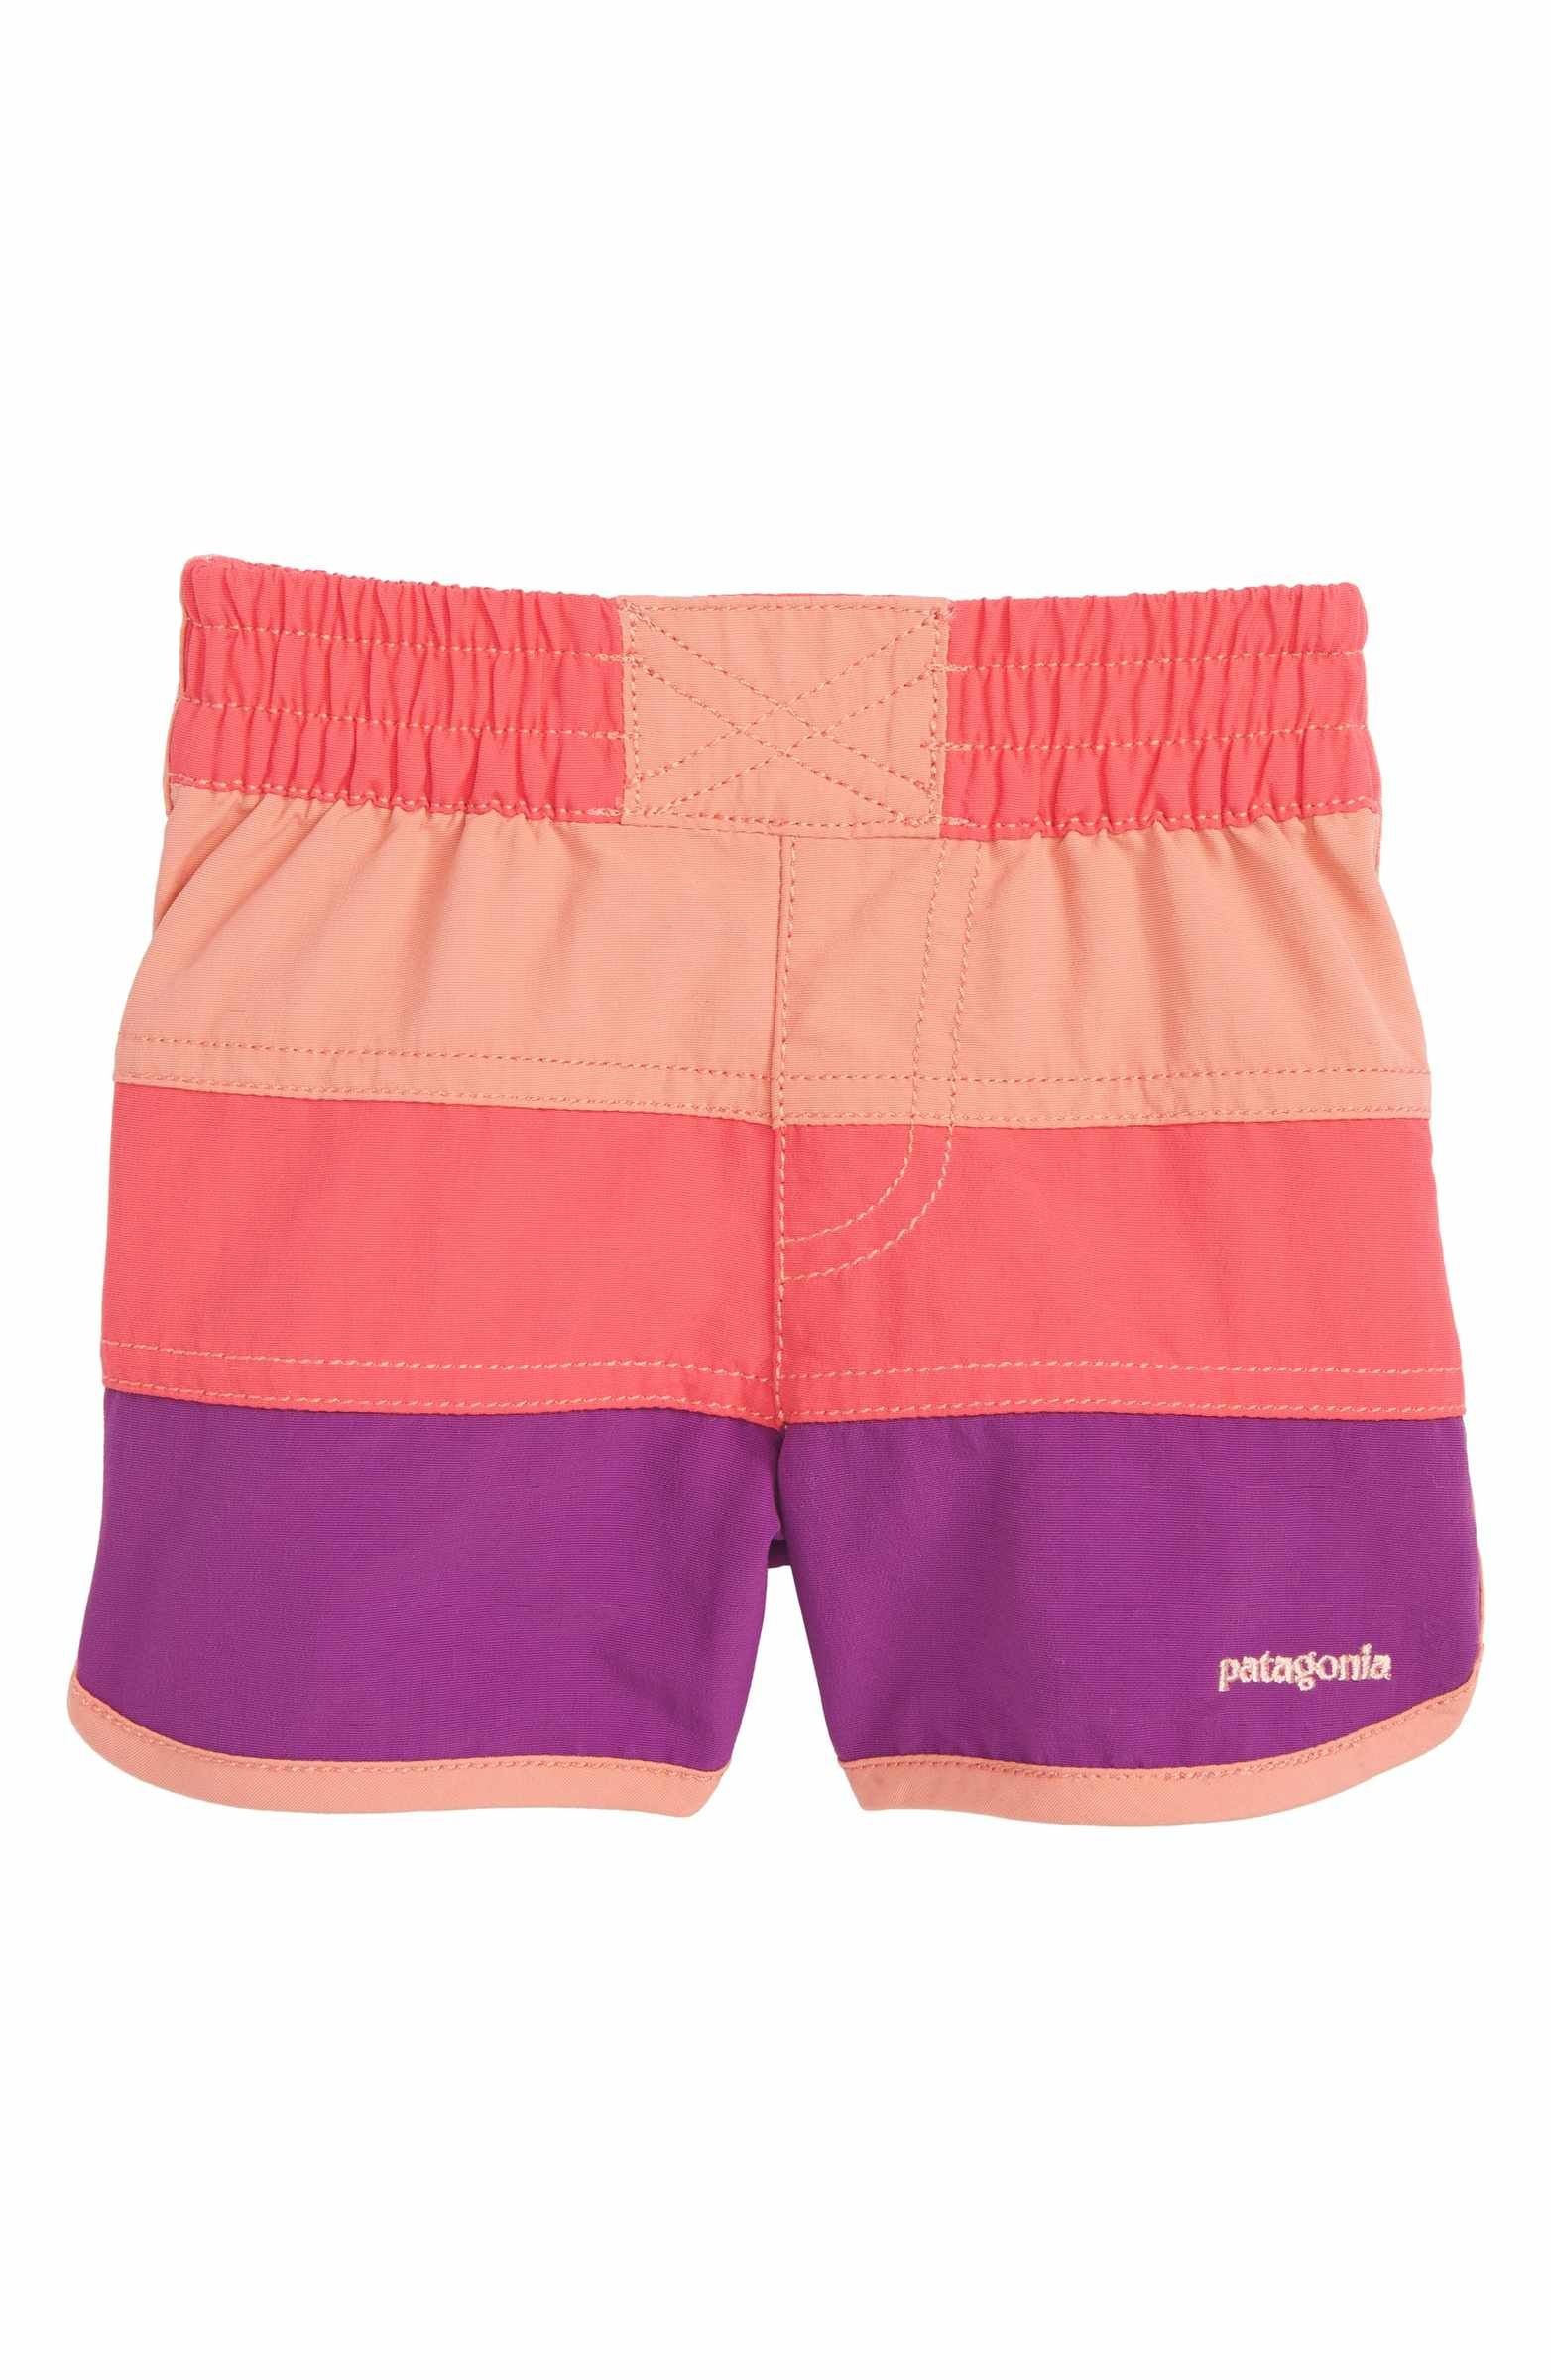 5d927dfaa2 Main Image - Patagonia Board Shorts (Baby Girls) | Dress the Toddler ...